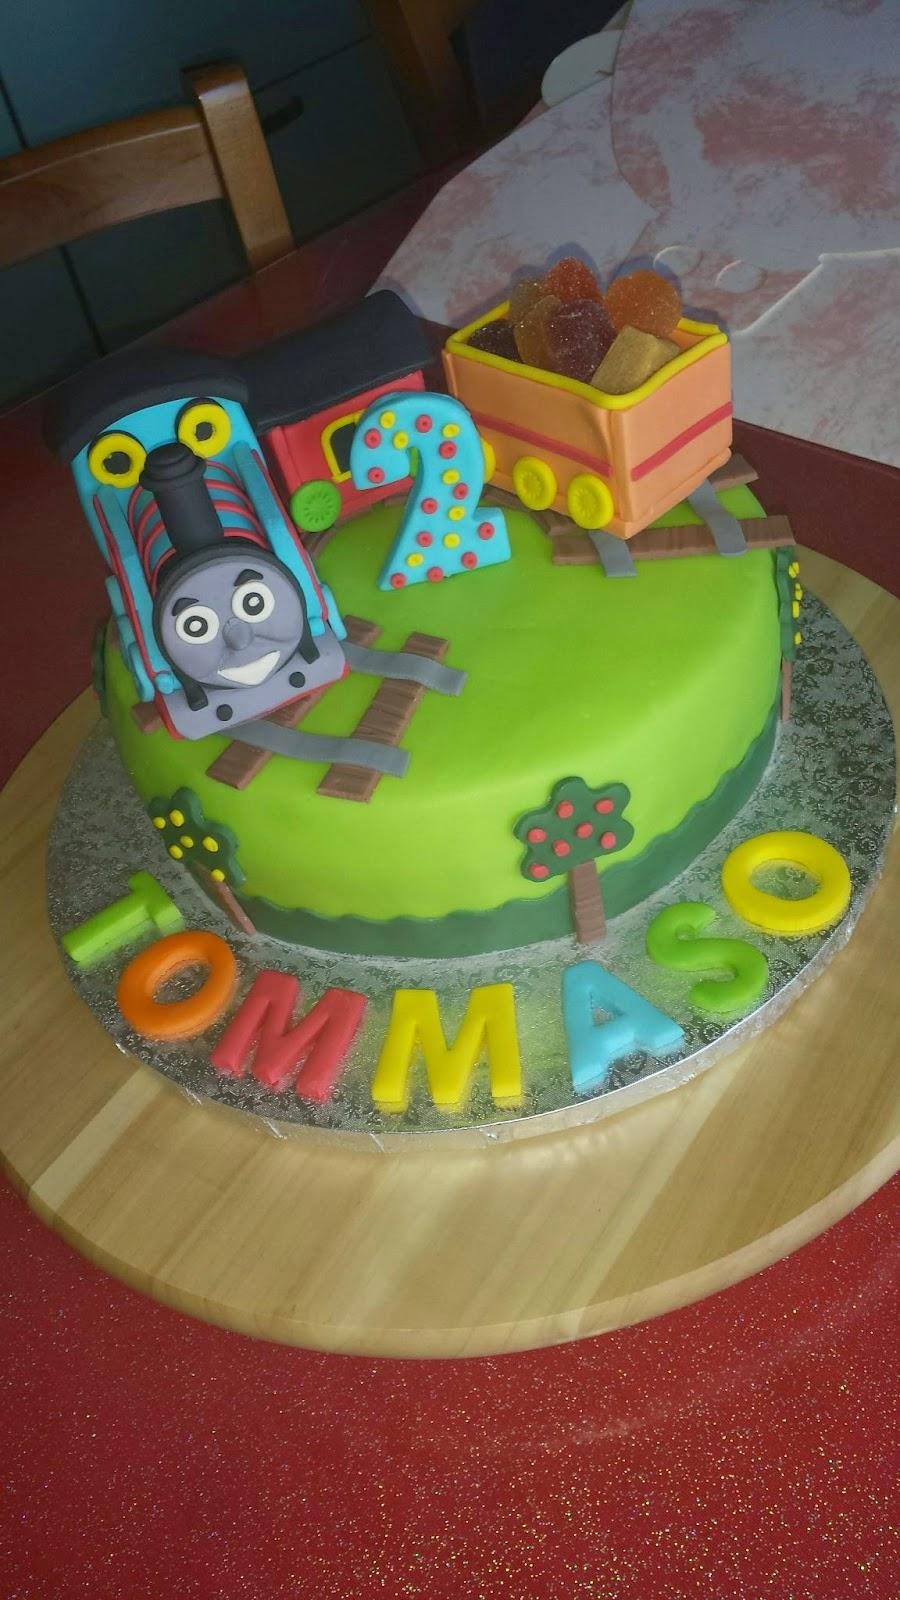 Le mie dolci creazioni torta trenino thomas for Decorazioni torte trenino thomas